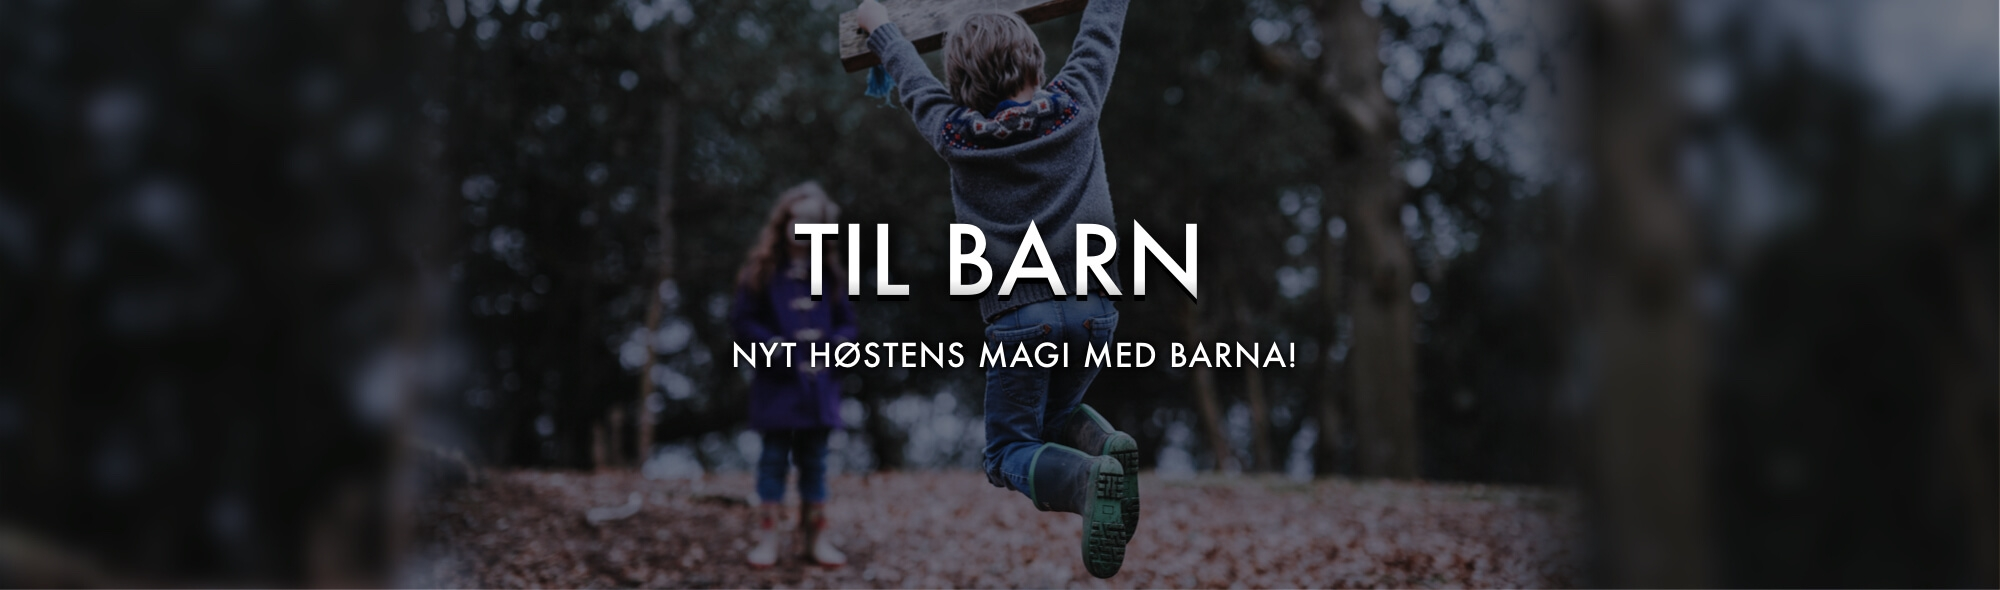 GÅSTOL & BÆRESELE